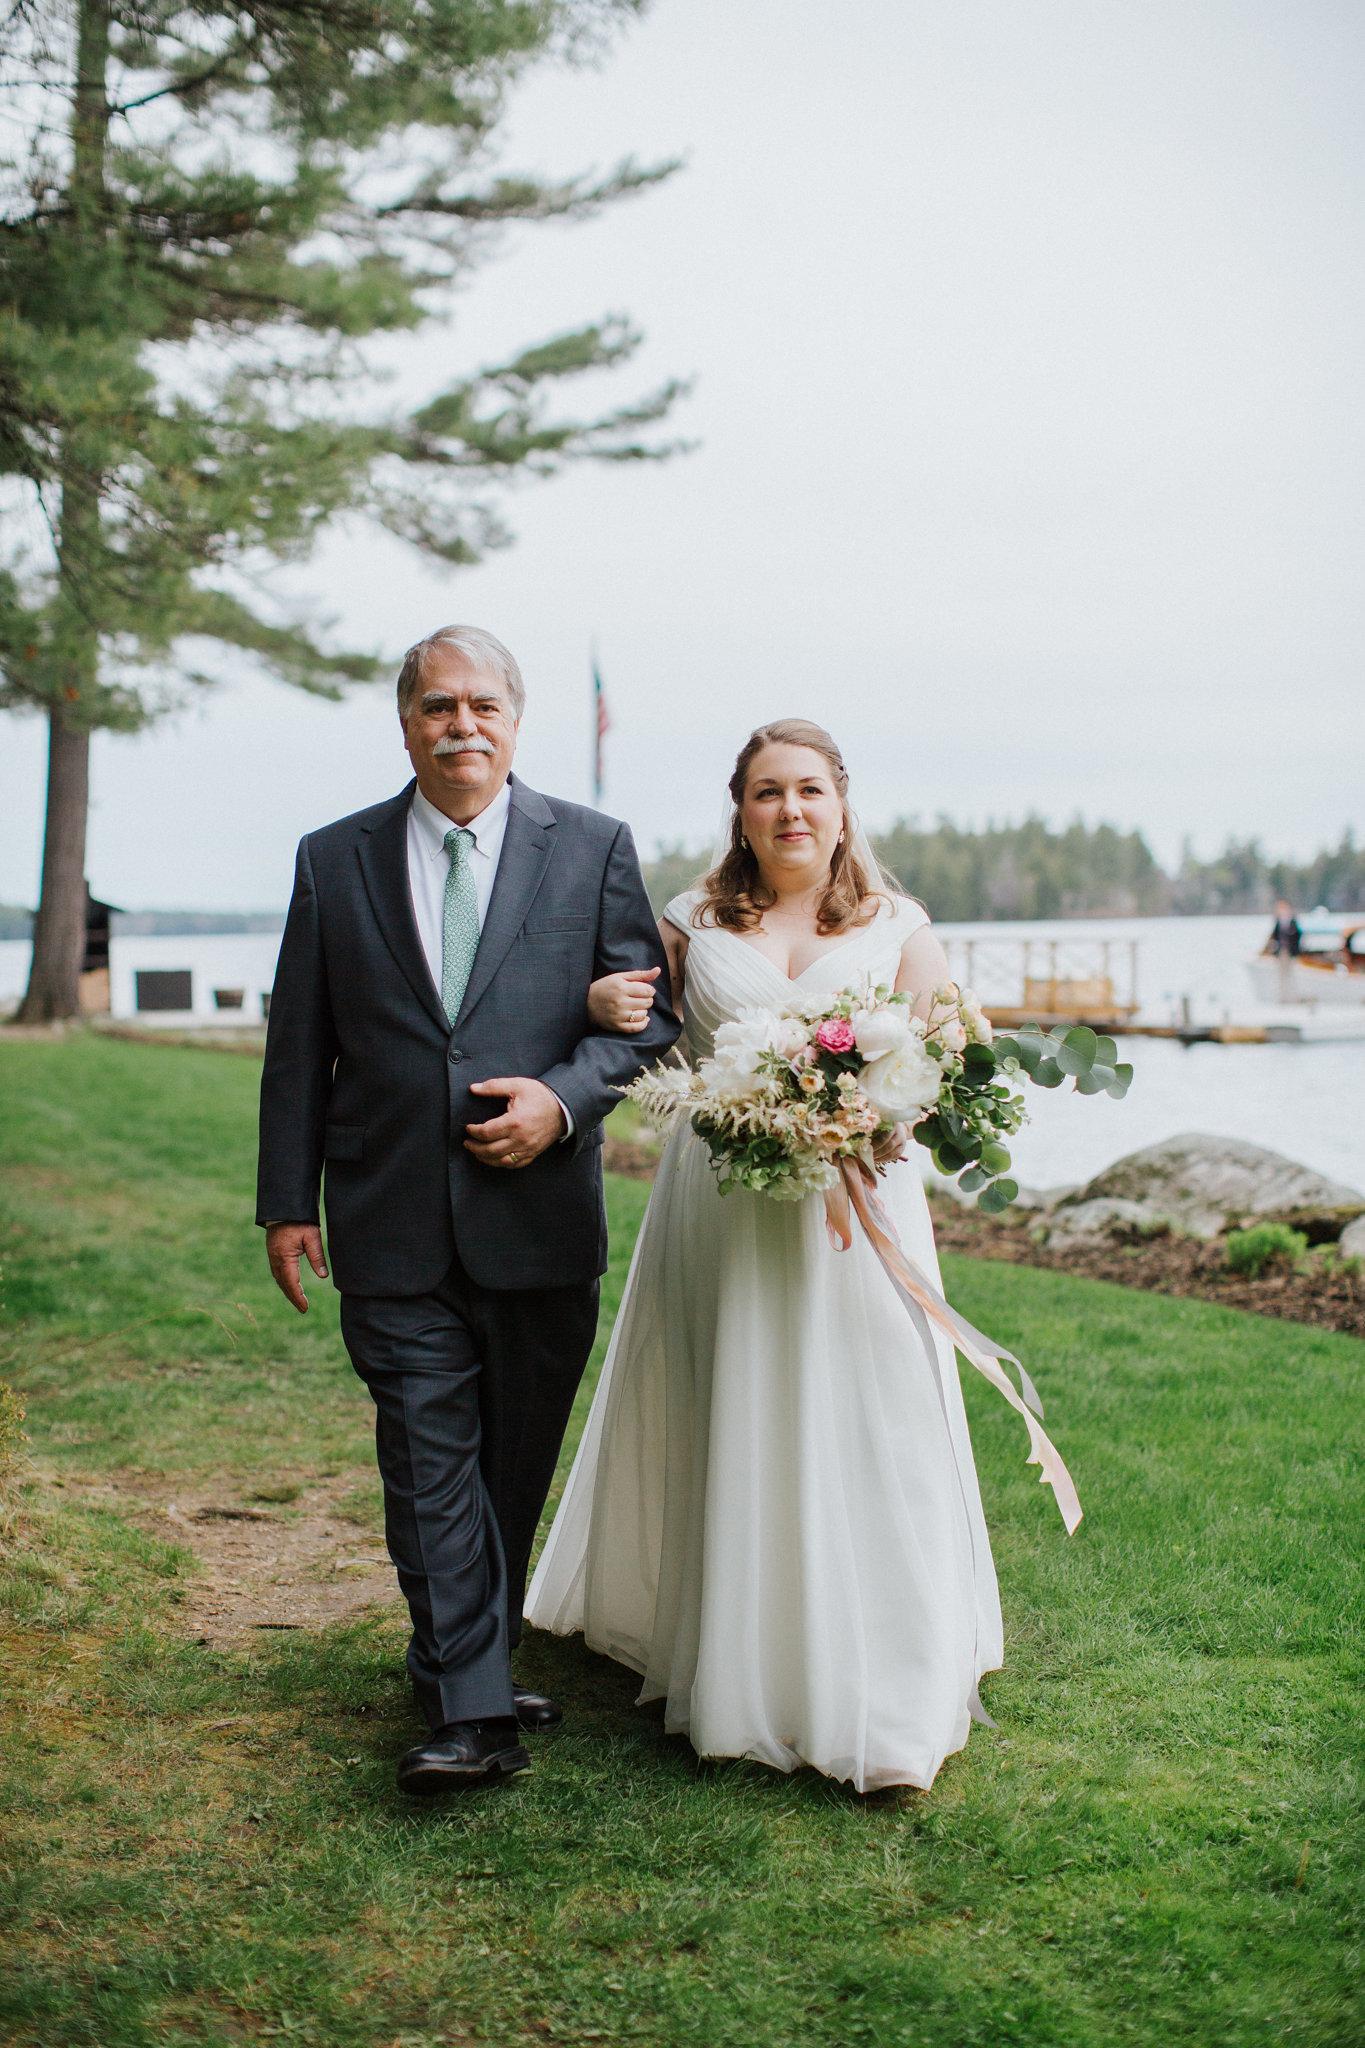 Sebago Lake Maine wedding officiant: A Sweet Start